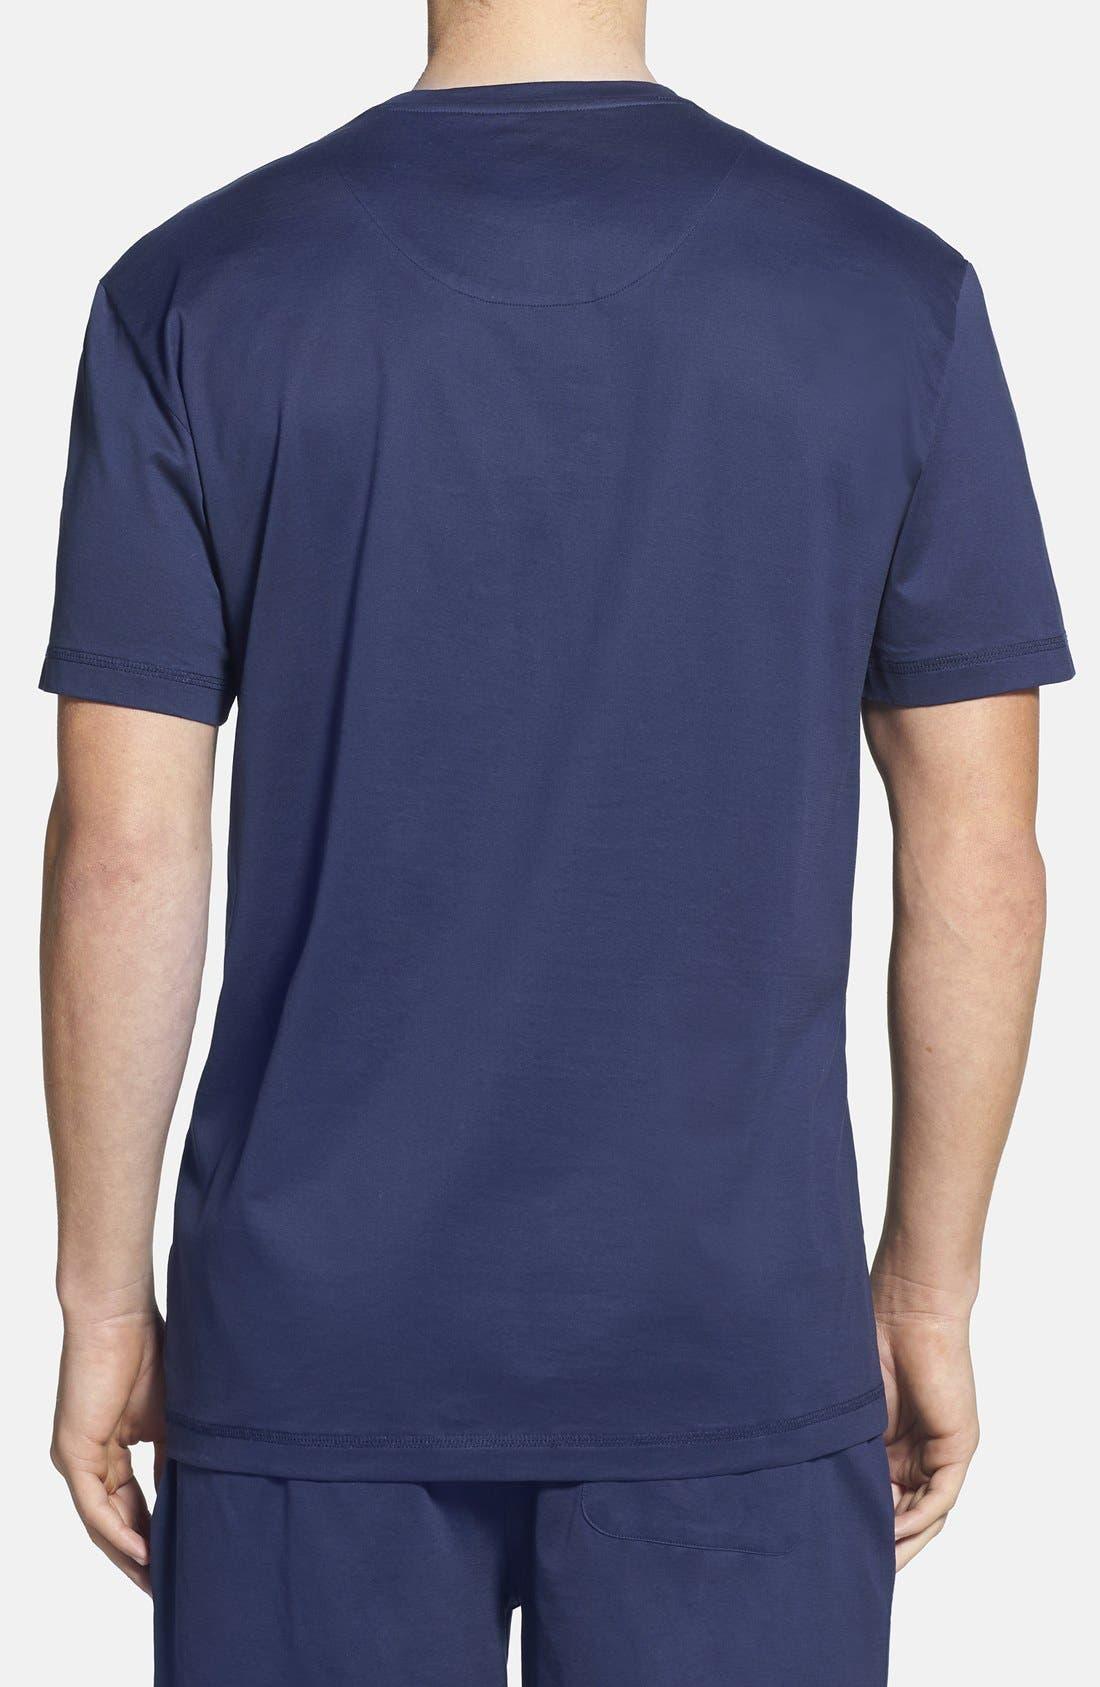 Alternate Image 2  - Majestic International 'Down Time' Crewneck T-Shirt